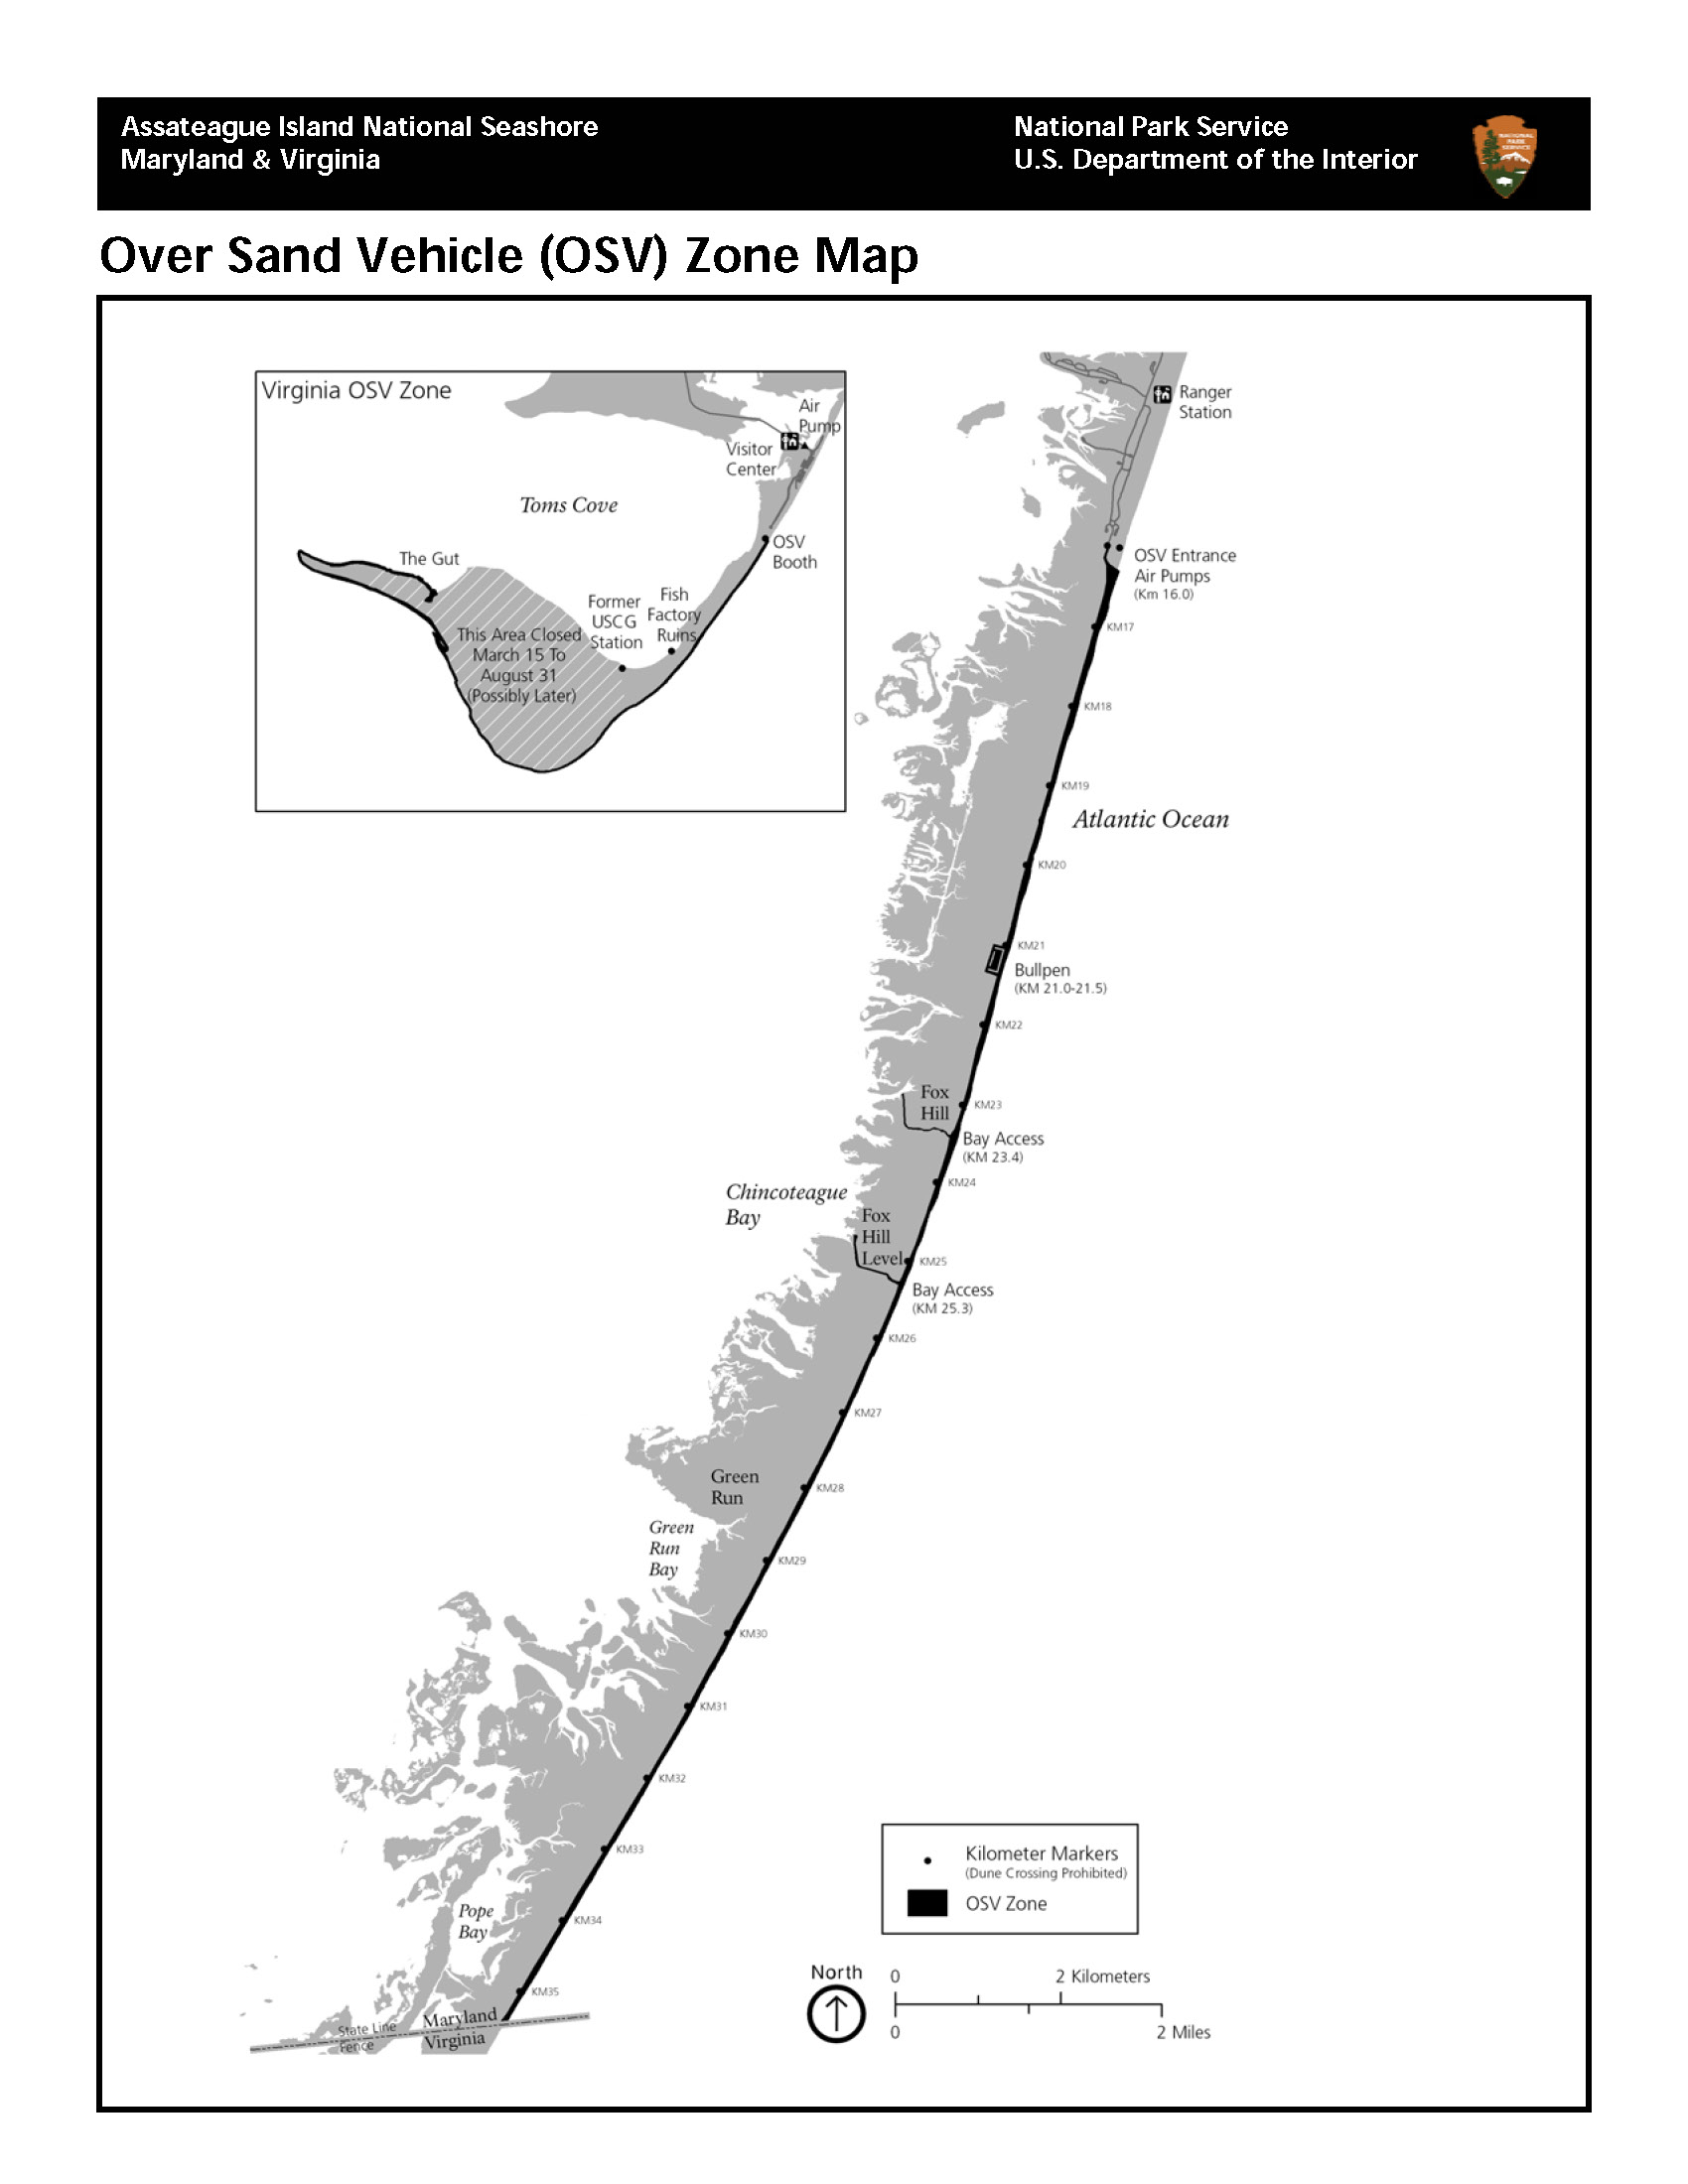 Over Sand Vehicle (Osv) Use – Assateague Island National Inside Maryland Hunting Calendar 2021